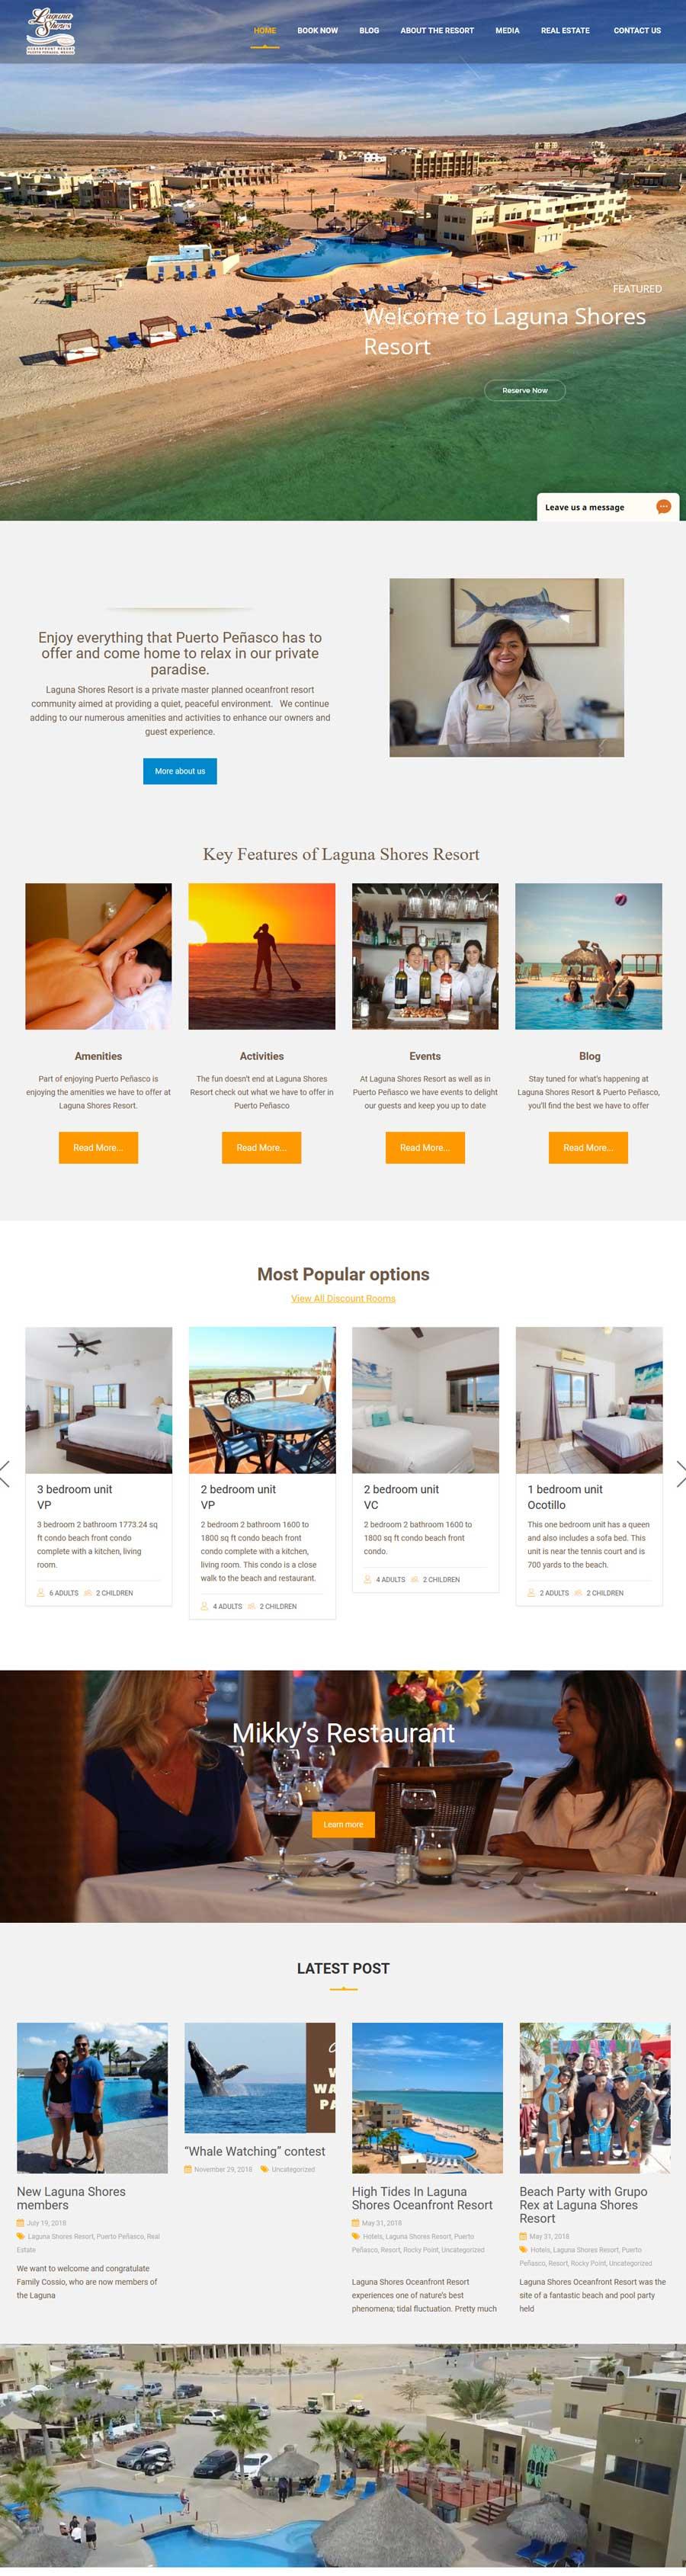 Laguna Shores Resort in Rocky Point (Puerto Penasco). Click here to visit Laguna Shores Resort's website